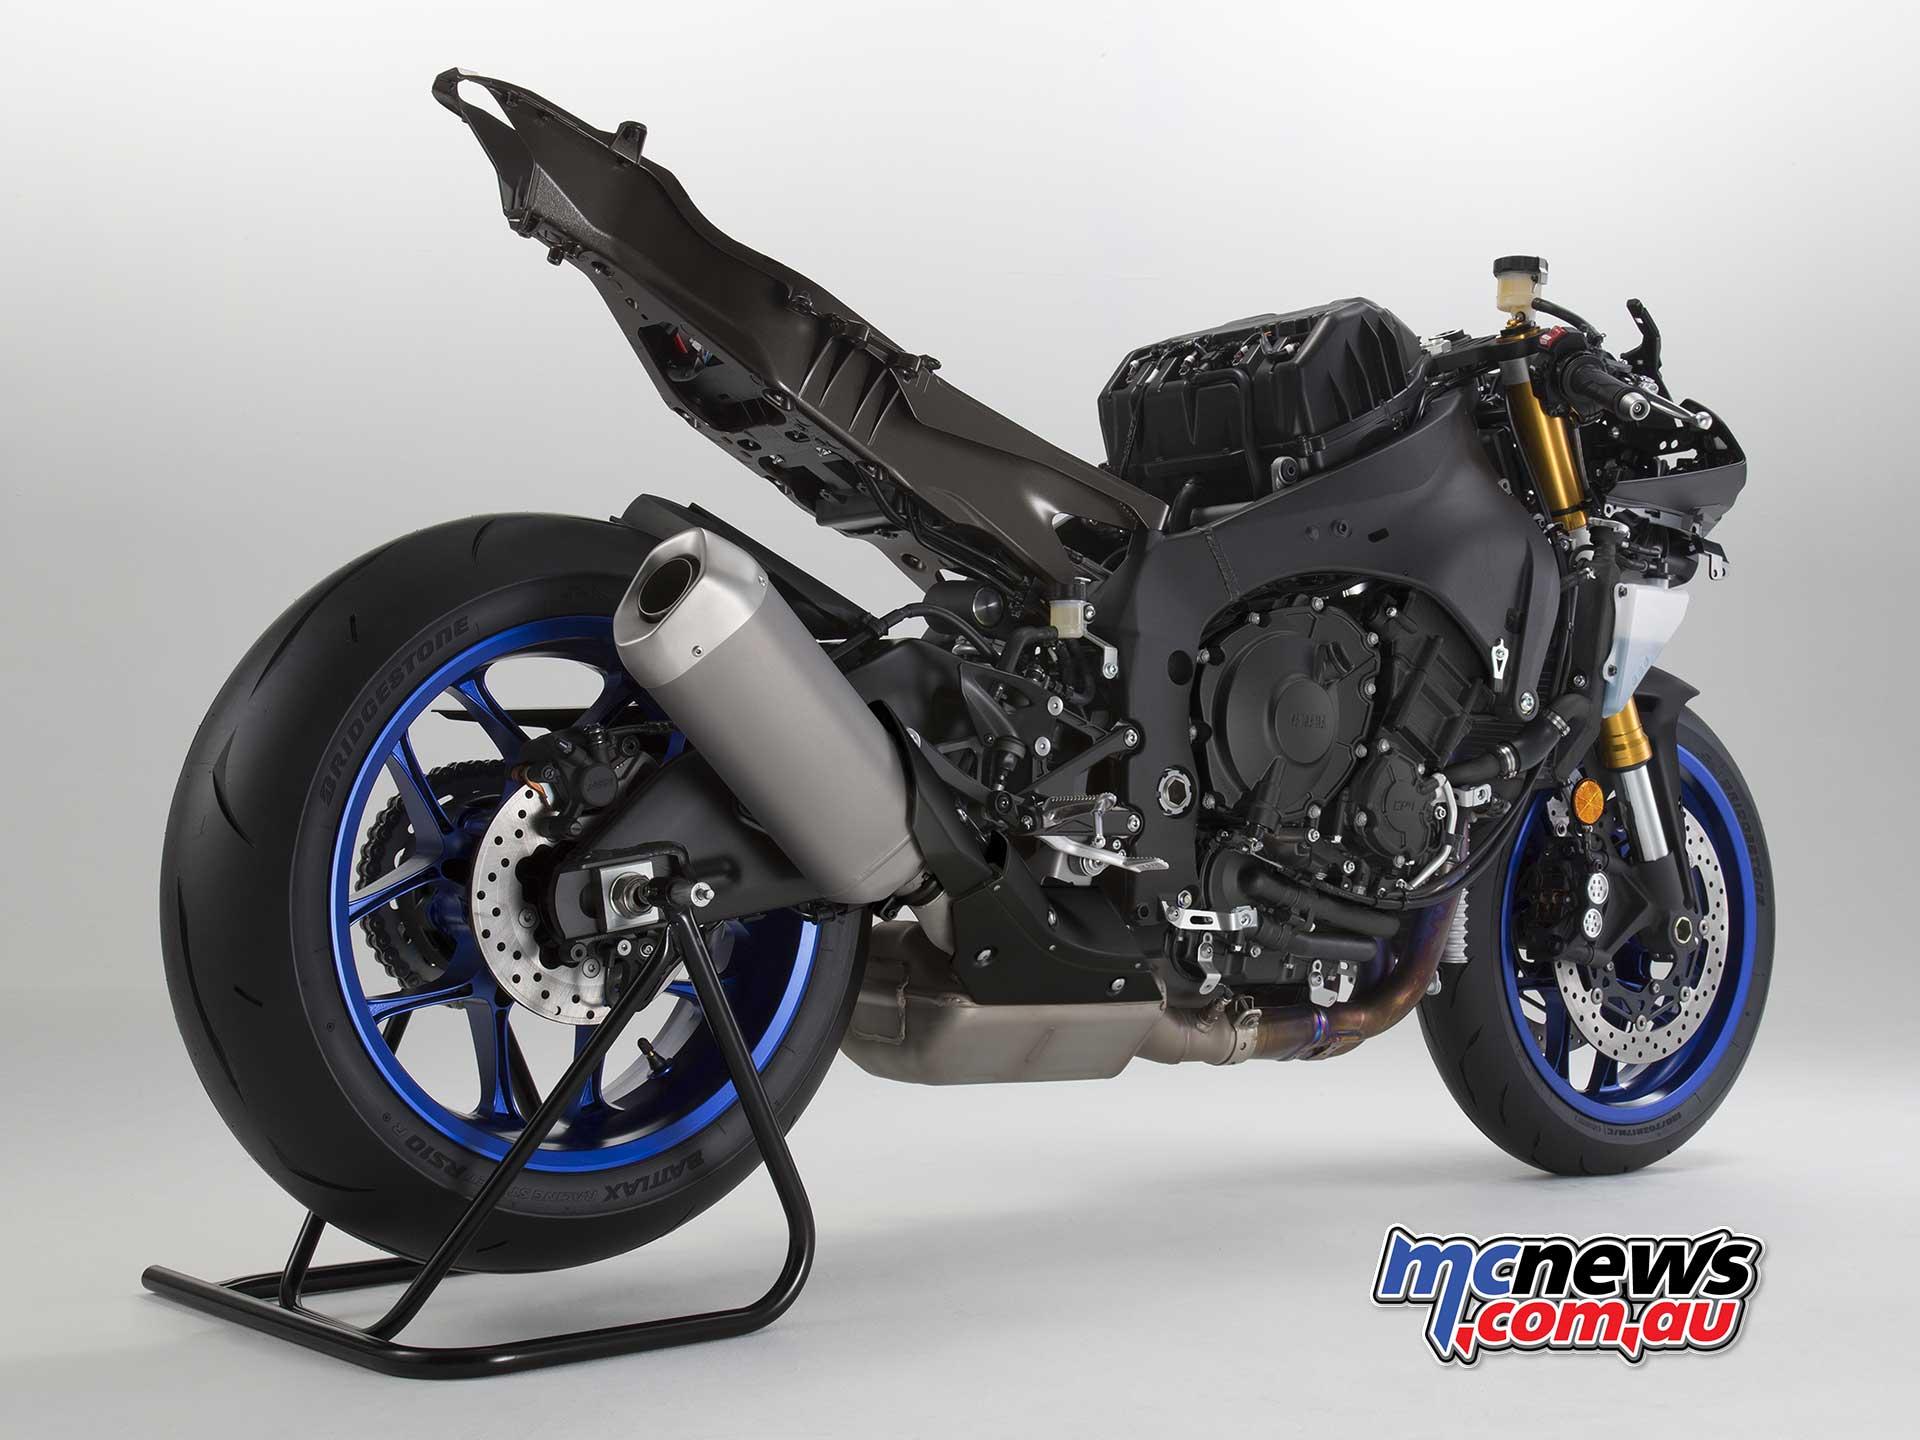 2018 Yamaha YZF-R1M | New Suspension & Tech | MCNews com au